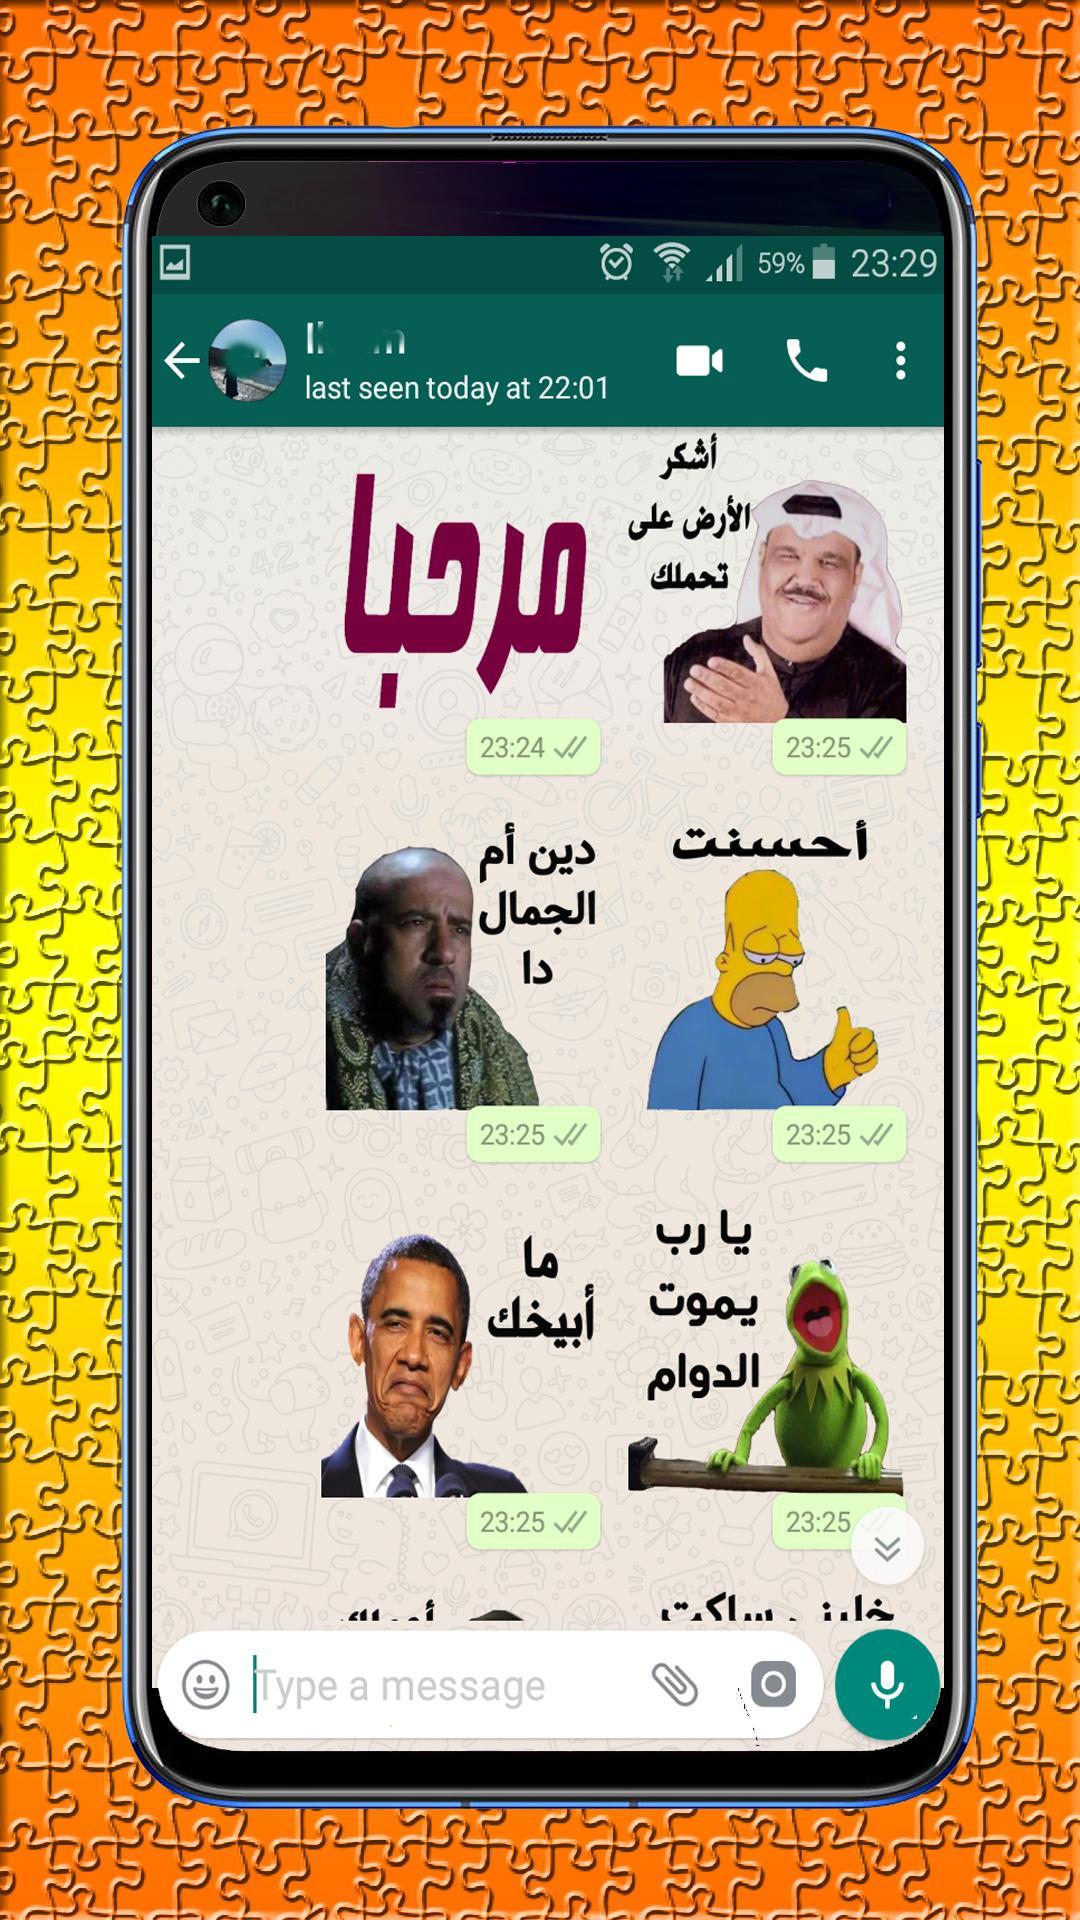 ملصقات واتساب عربية For Android Apk Download